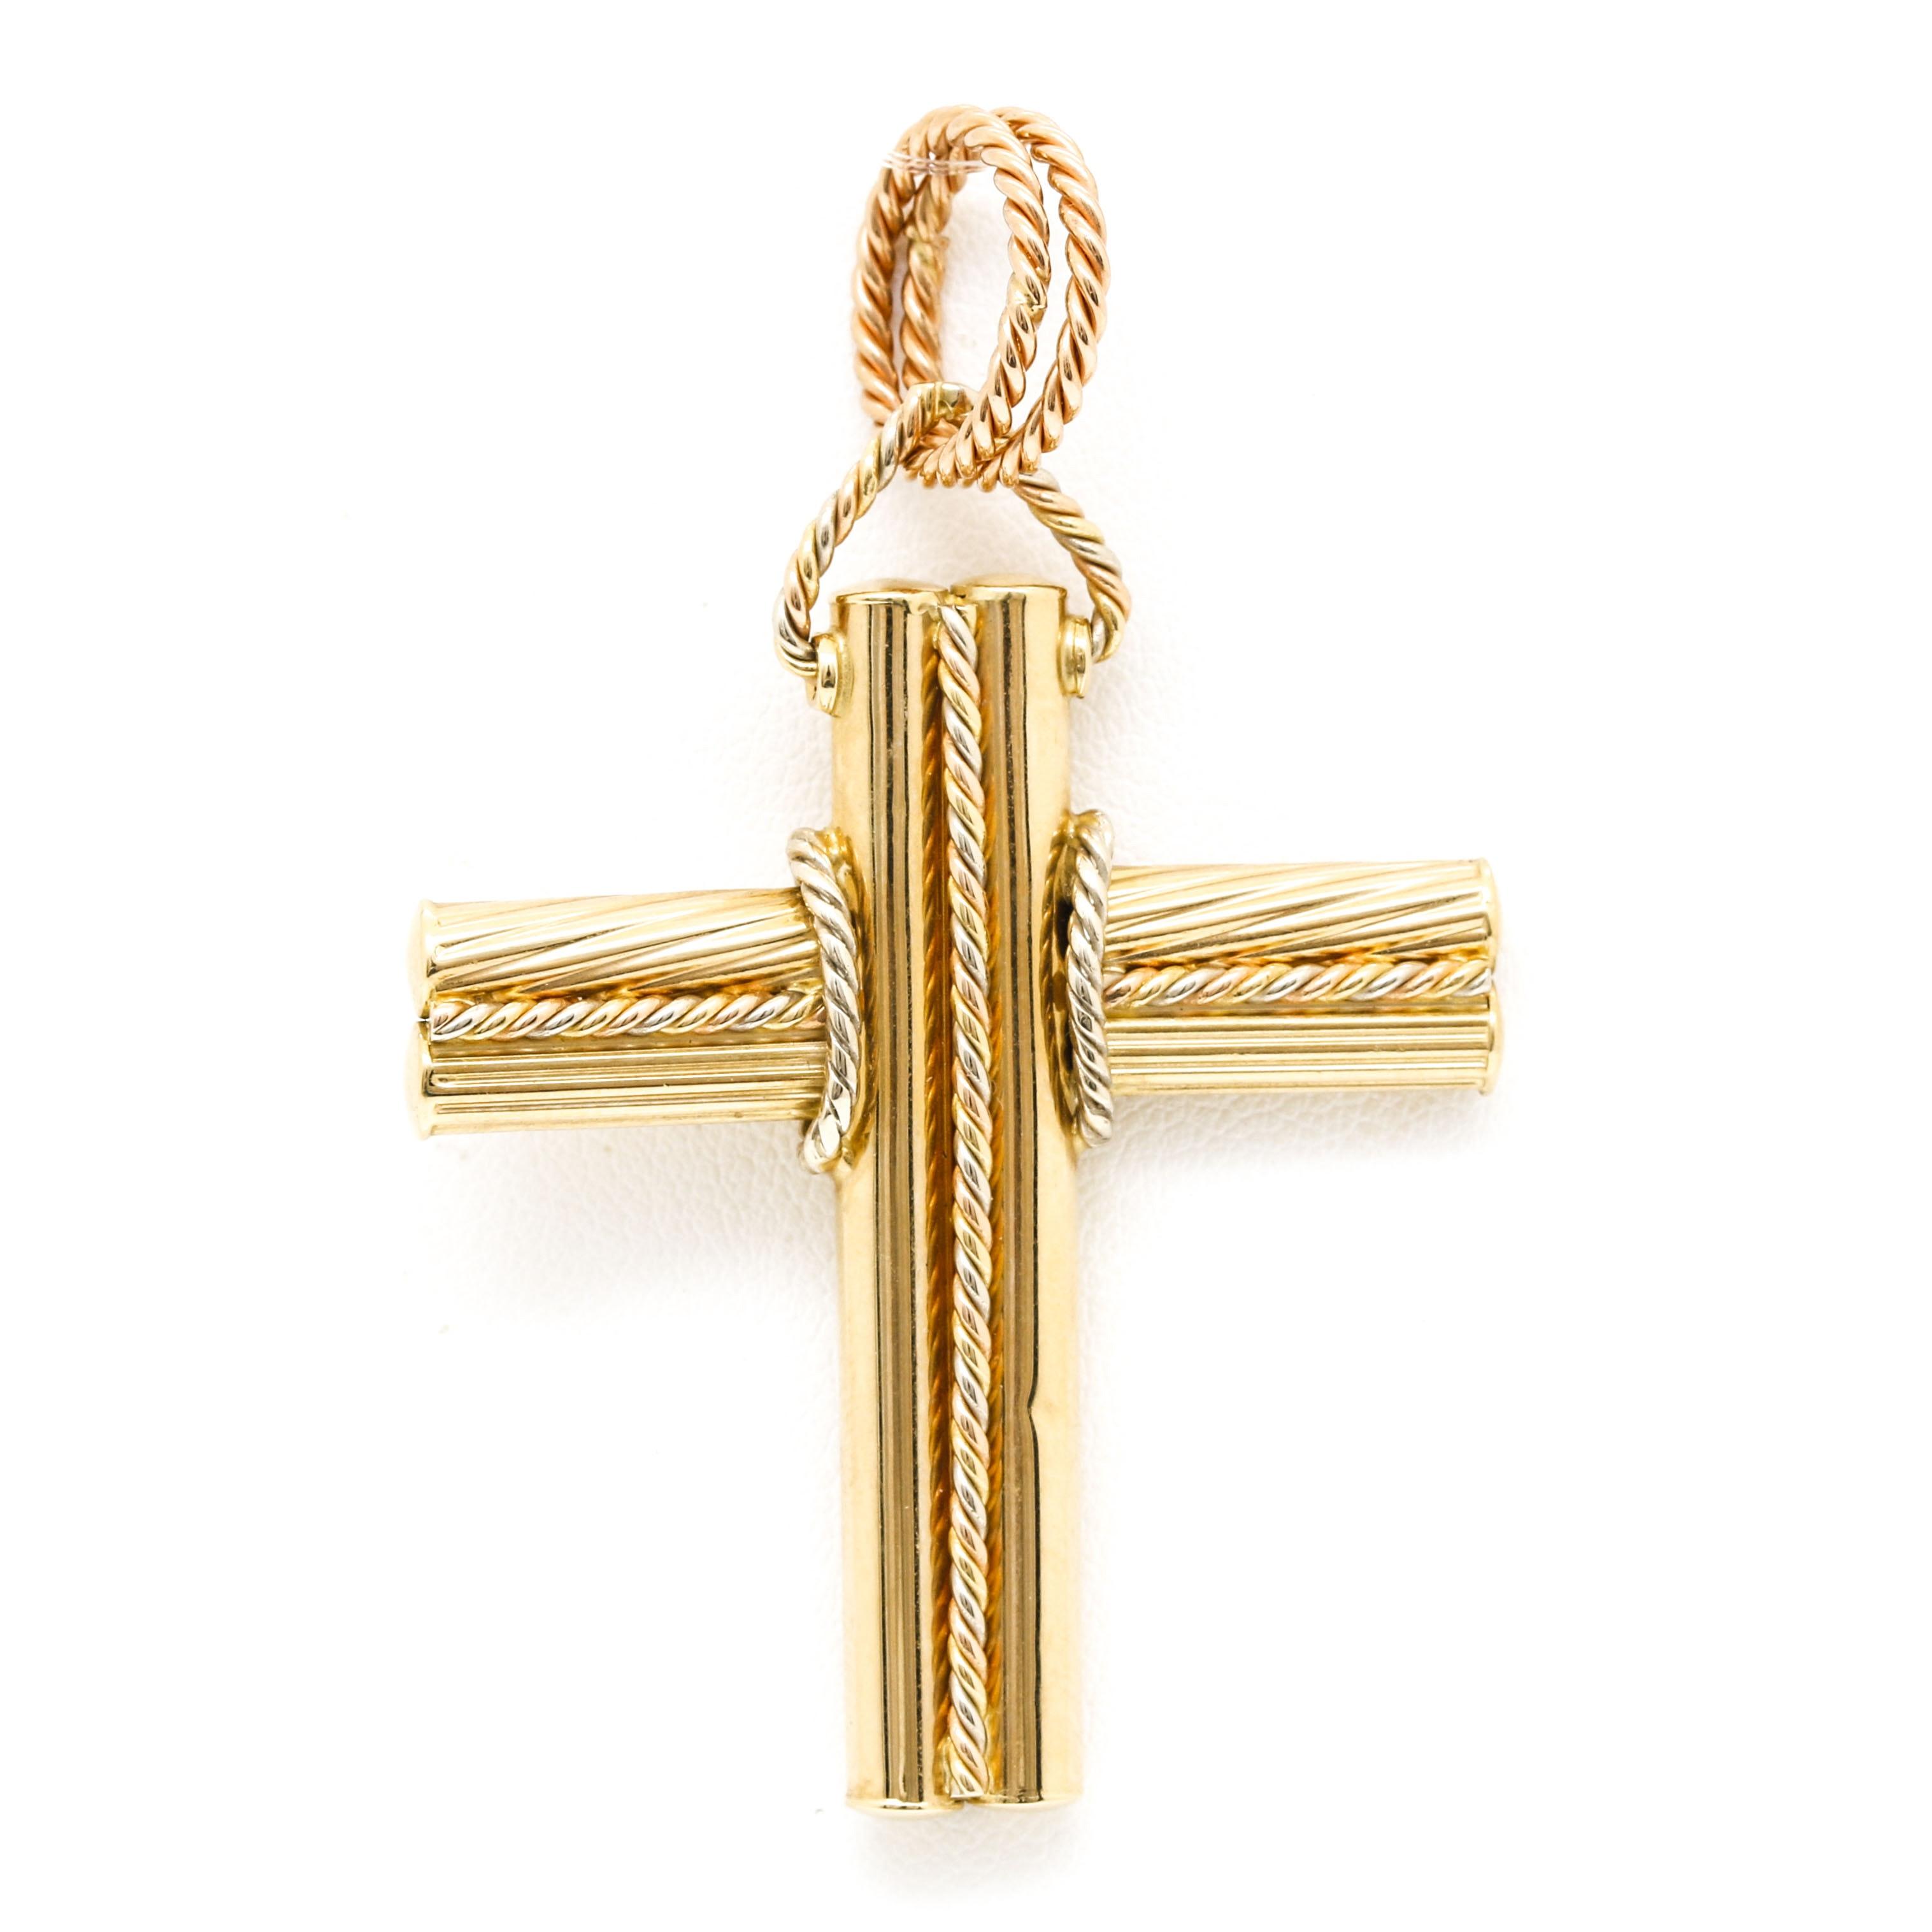 18K Yellow Gold Rope Cross Pendant